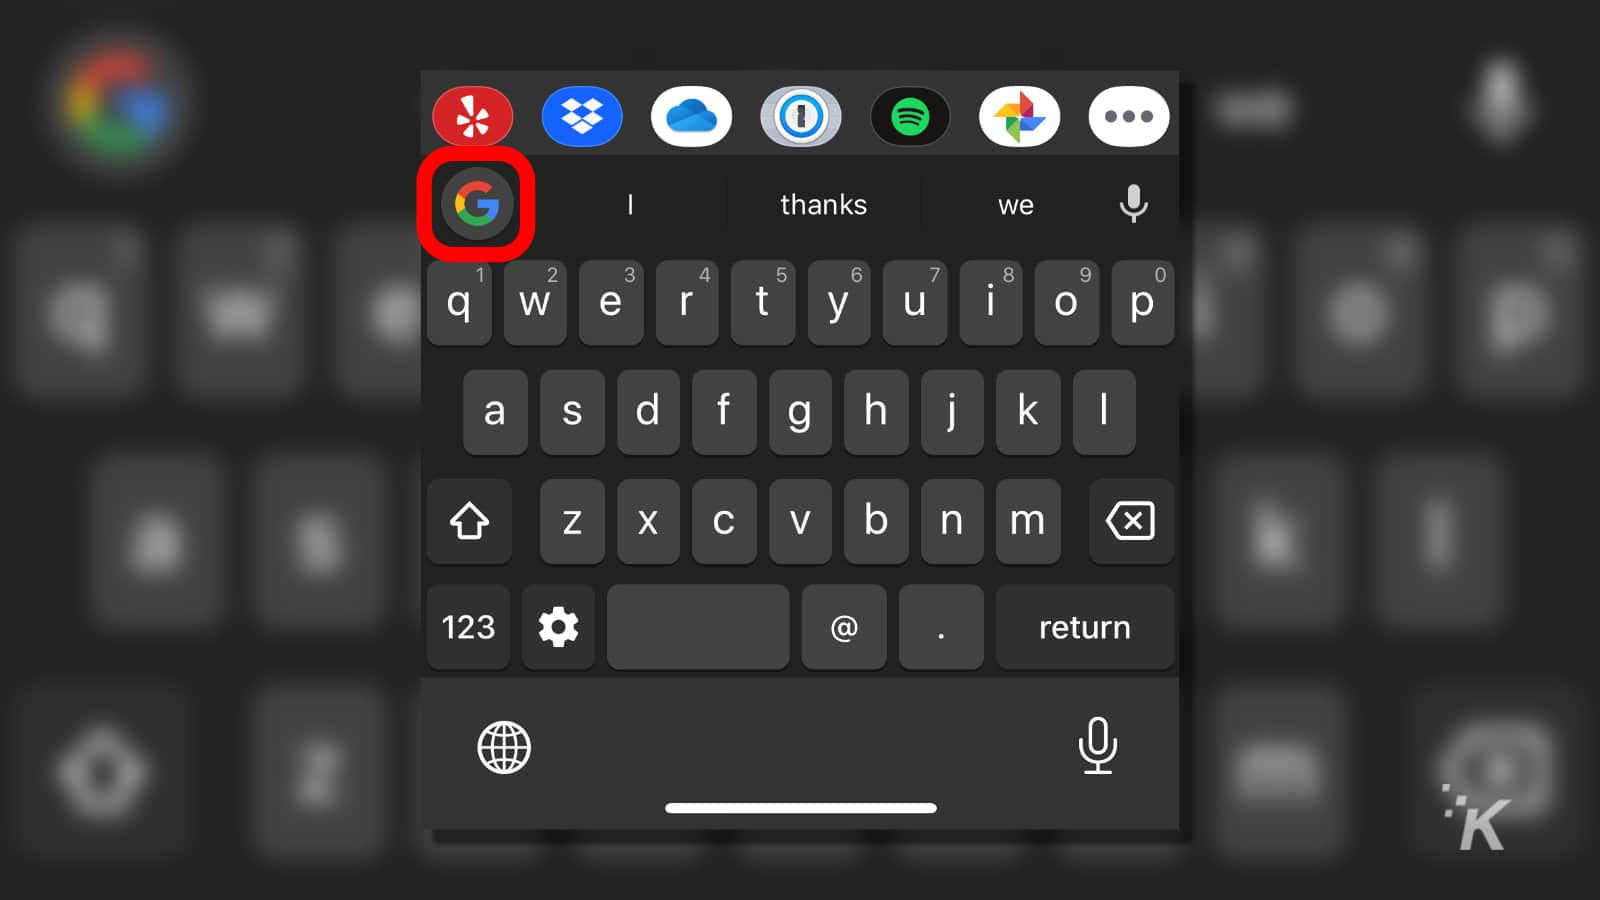 ios keyboard with gboard